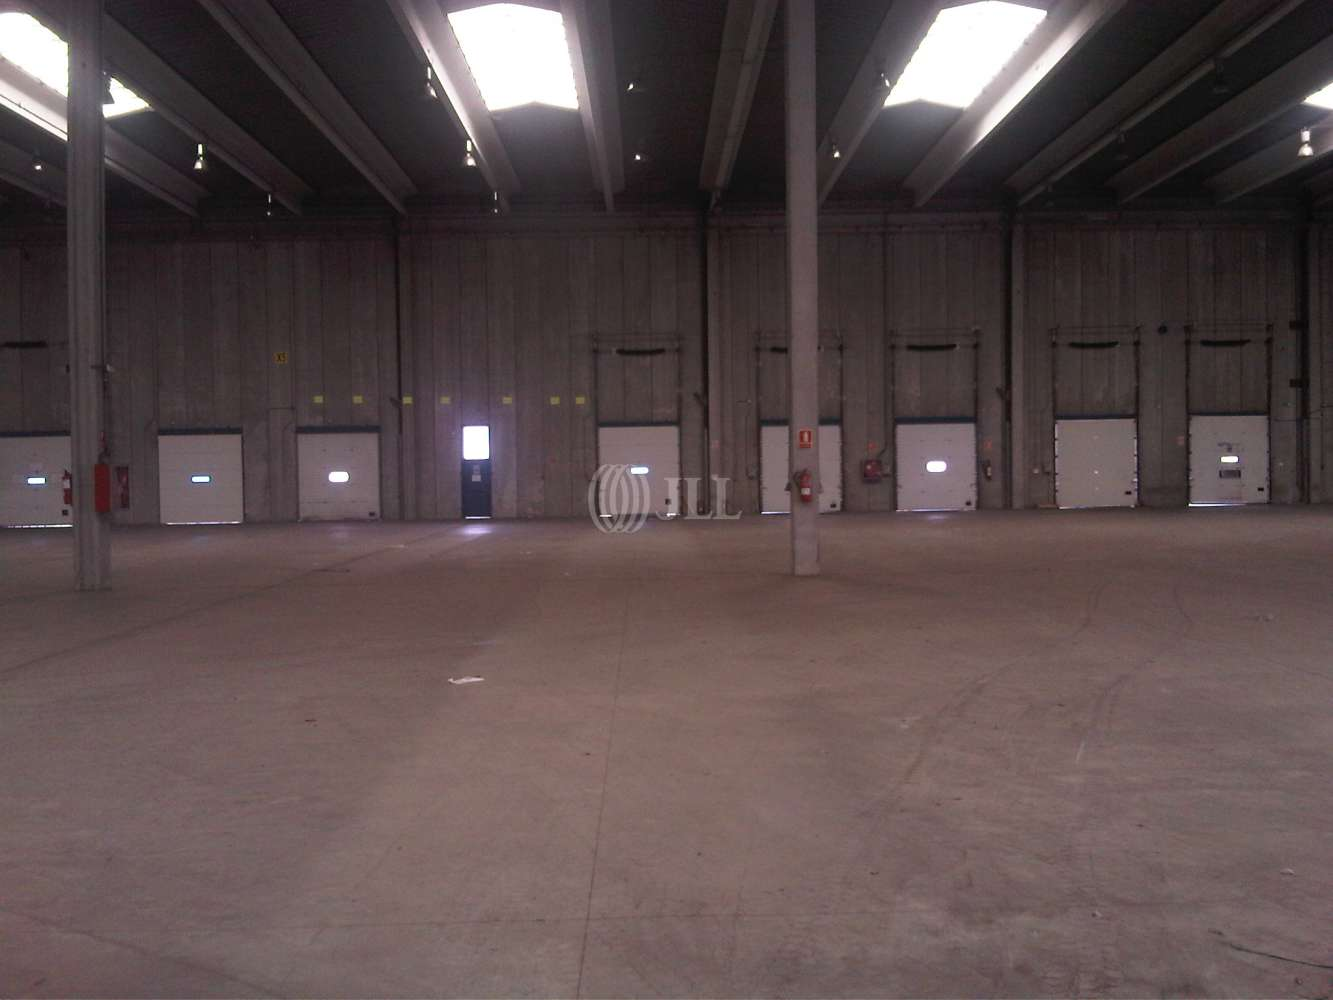 Naves industriales y logísticas Barcelona, 08040 - Nave Logistica - B0054 - PI ZAL I BARCELONA